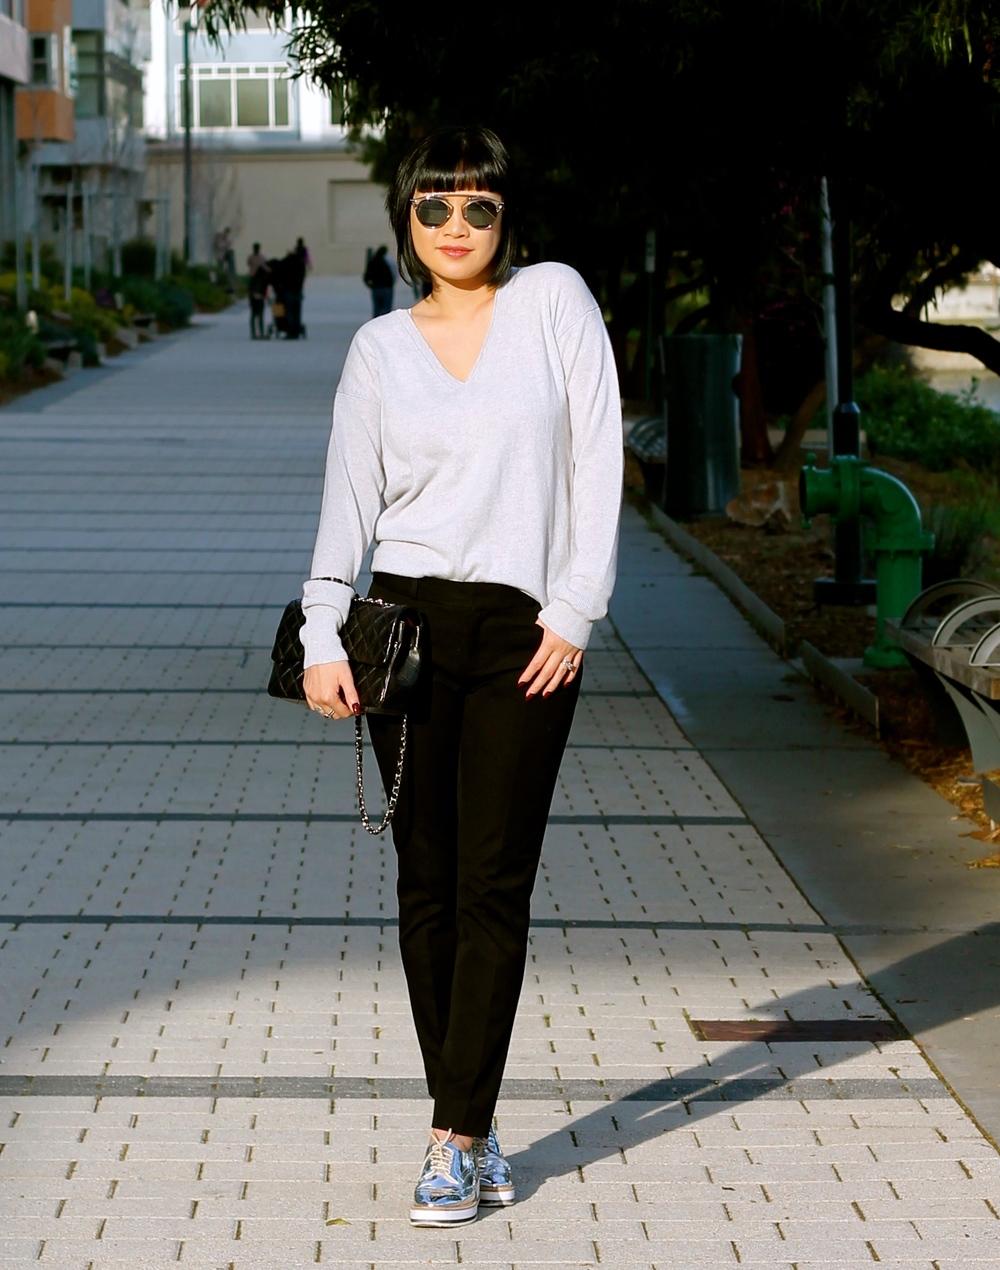 Banana Republic pants and sweater, Zara shoes, Chanel bag, Dior sunglasses